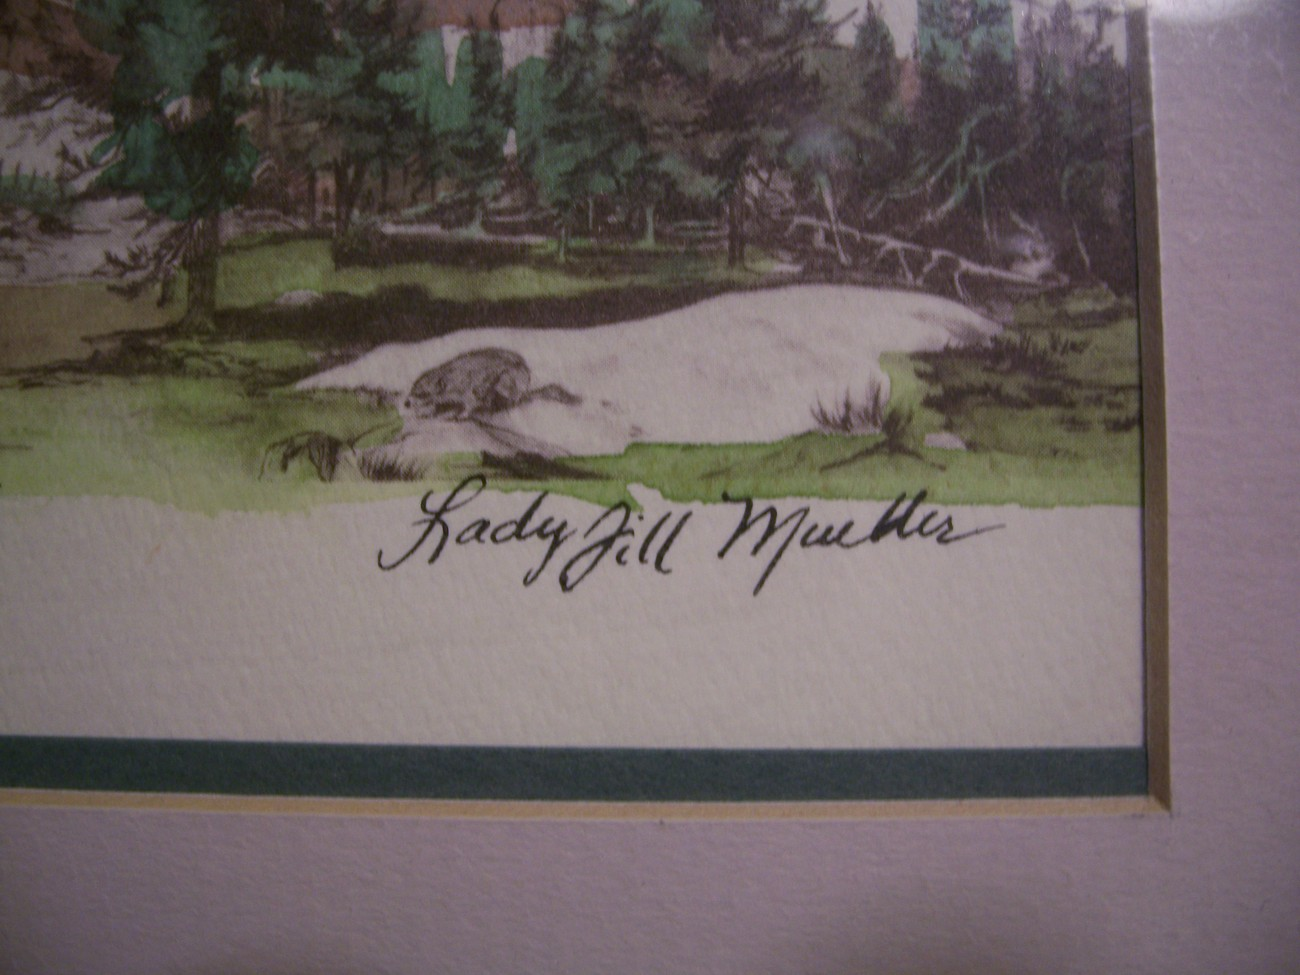 Framed Art Lady Jill Mueller Along The Pacific Crest Trail